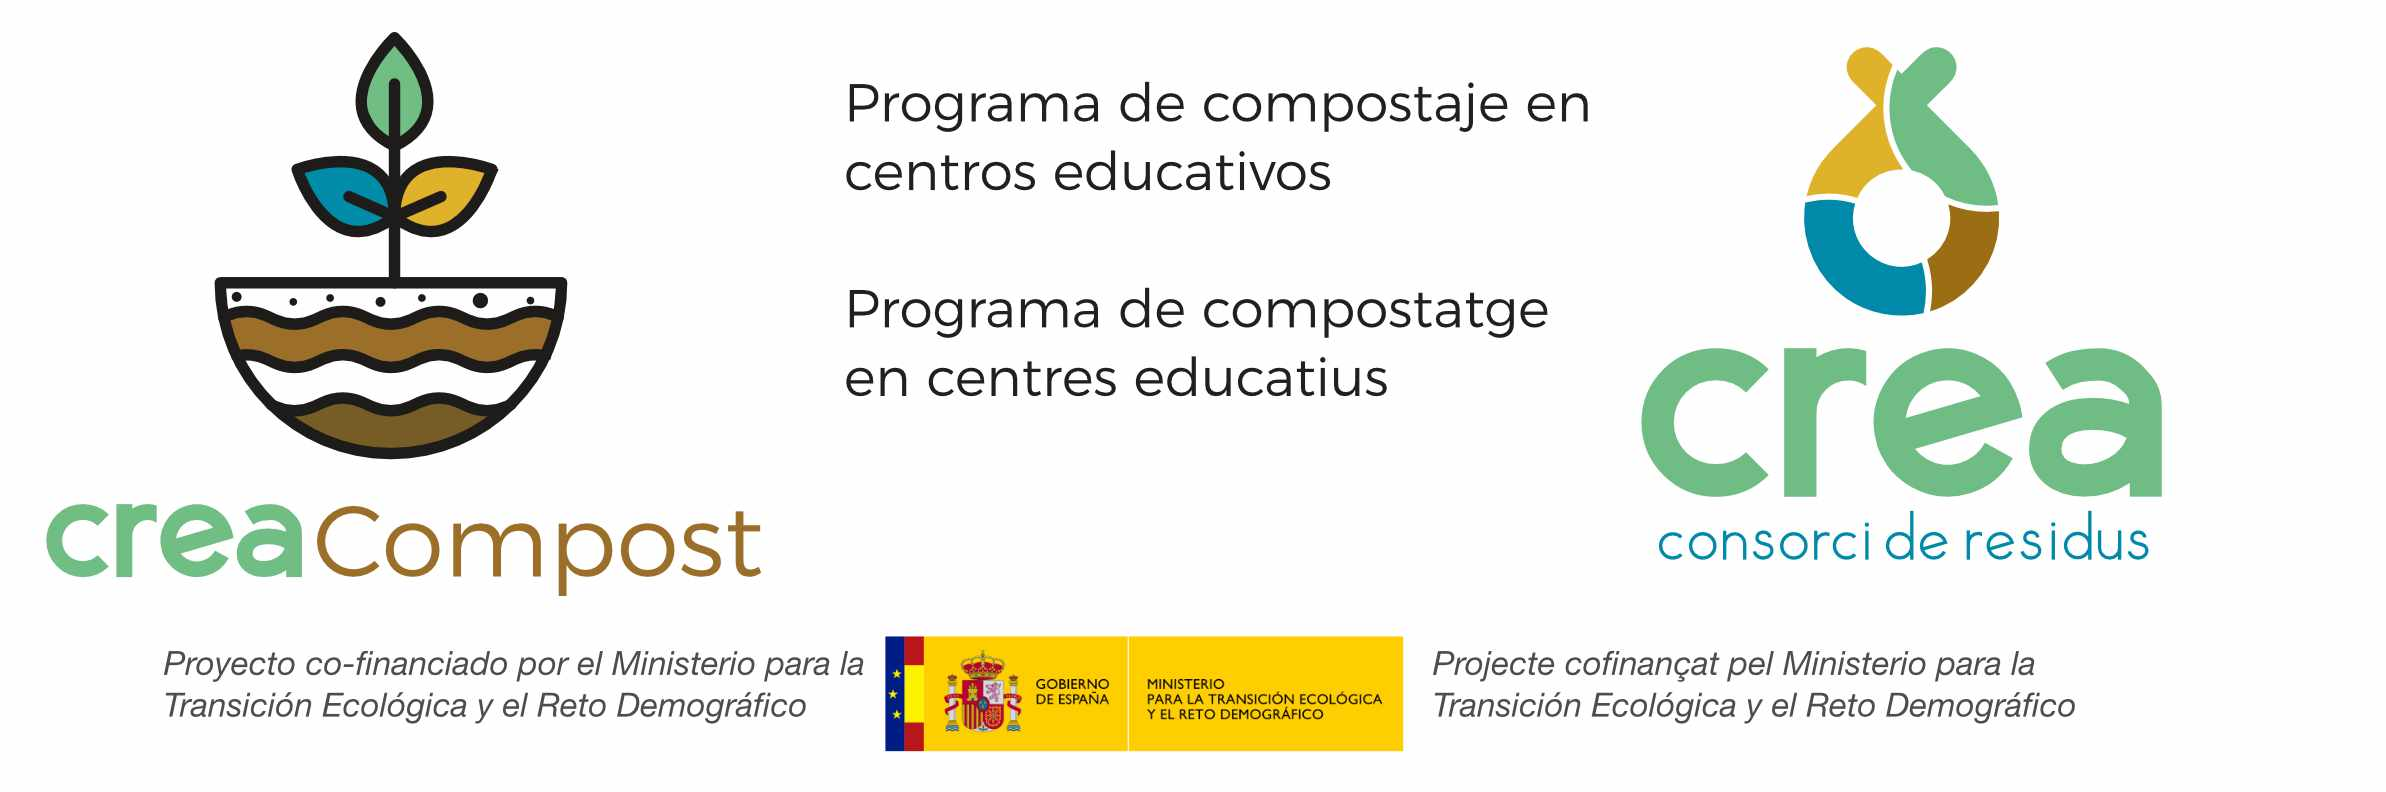 Programa de Compostaje en Centros Educativos logo